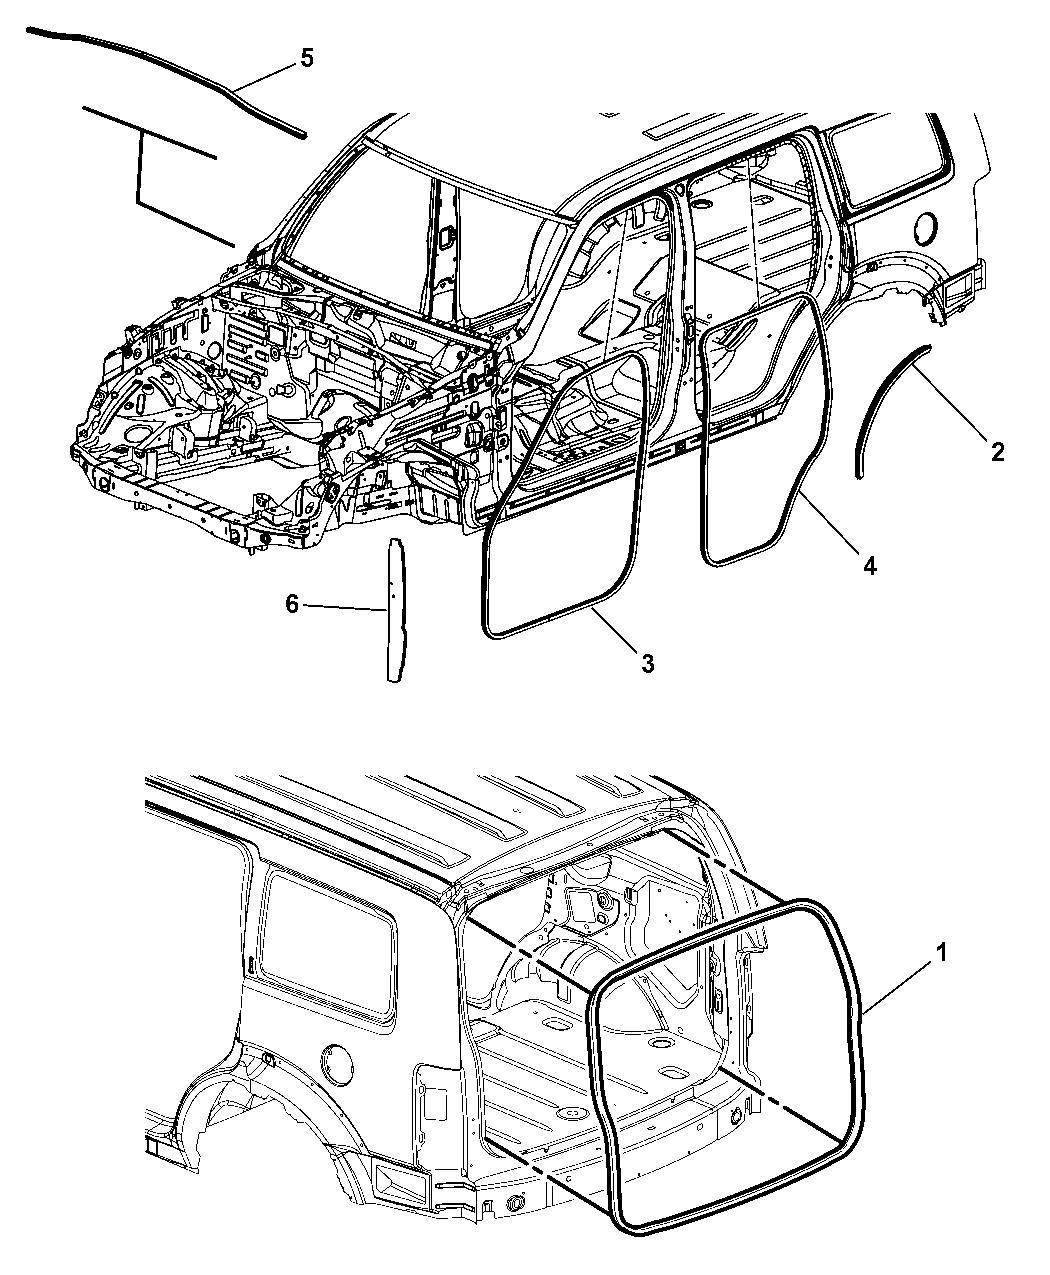 2009 Jeep Liberty Body Weatherstrips & Seals - Mopar Parts ...